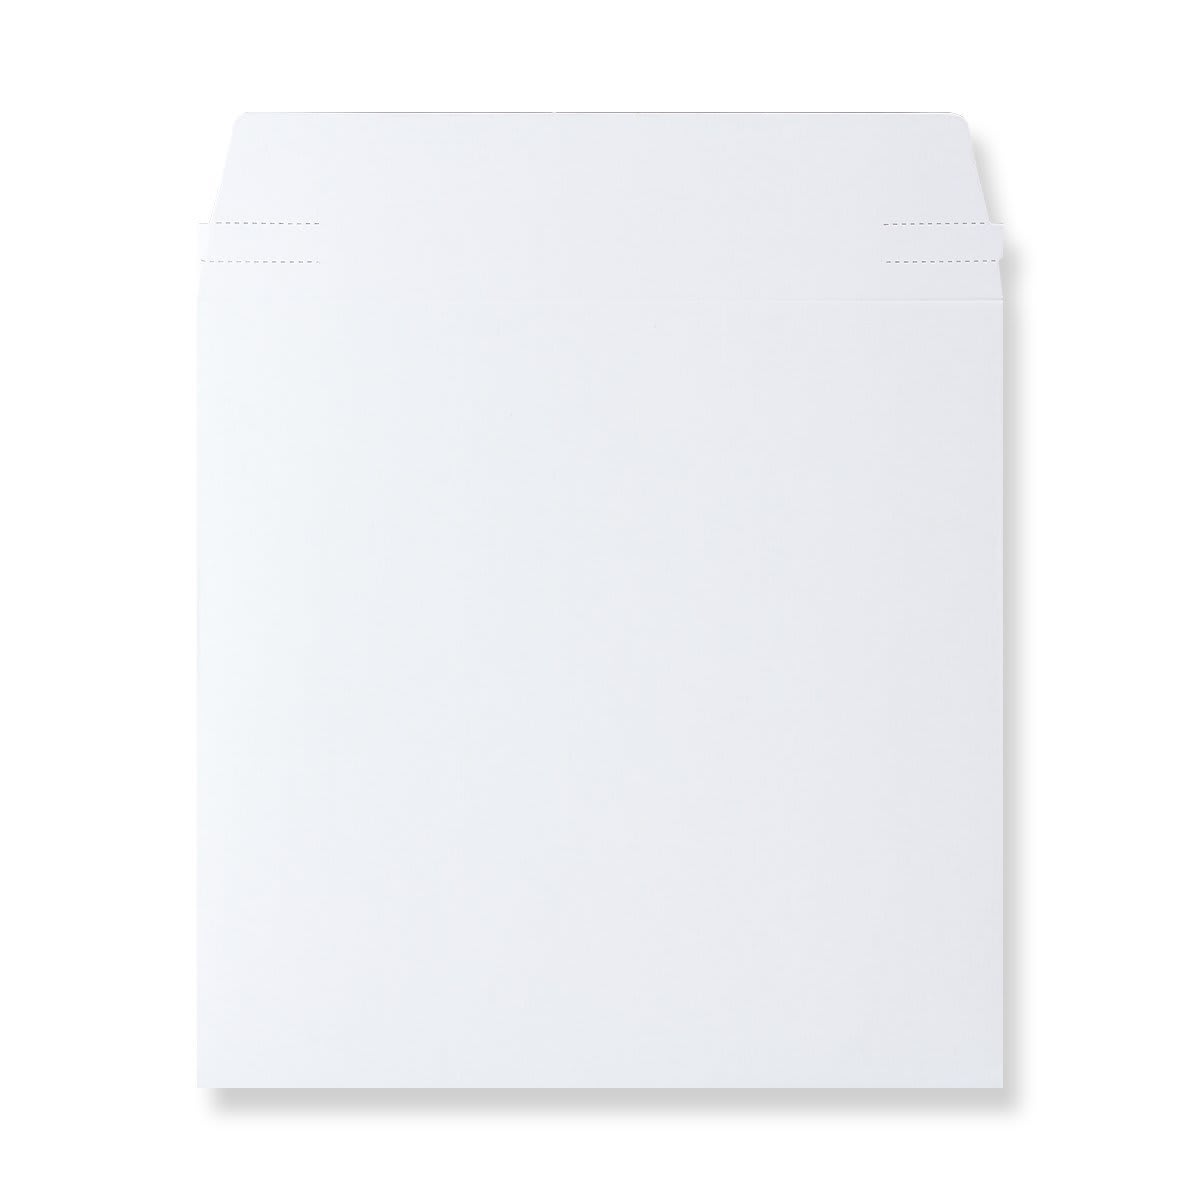 195 x 195mm WHITE ALL BOARD ENVELOPES